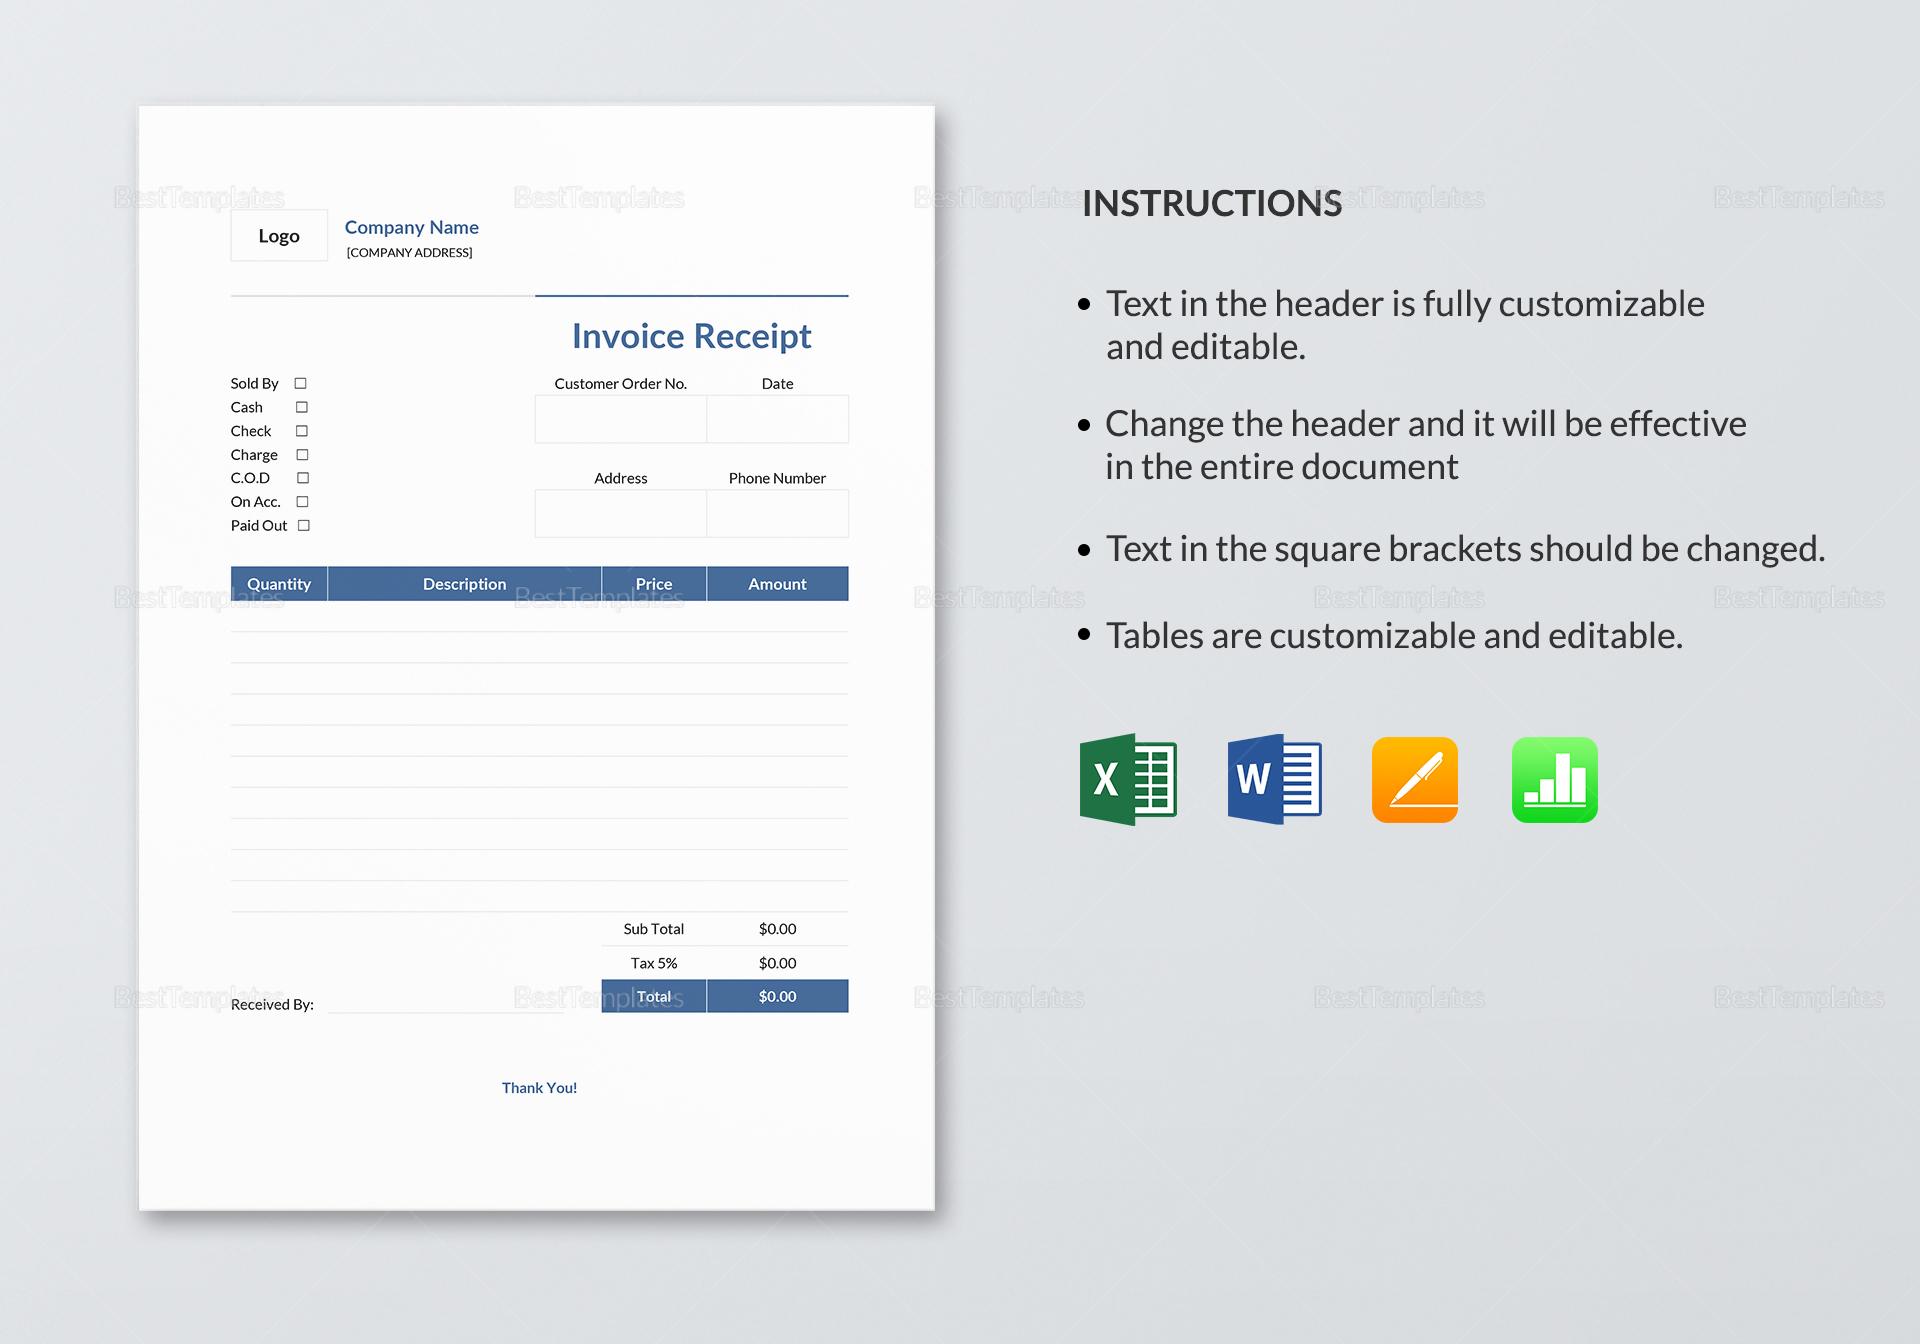 Sample Invoice Receipt Template